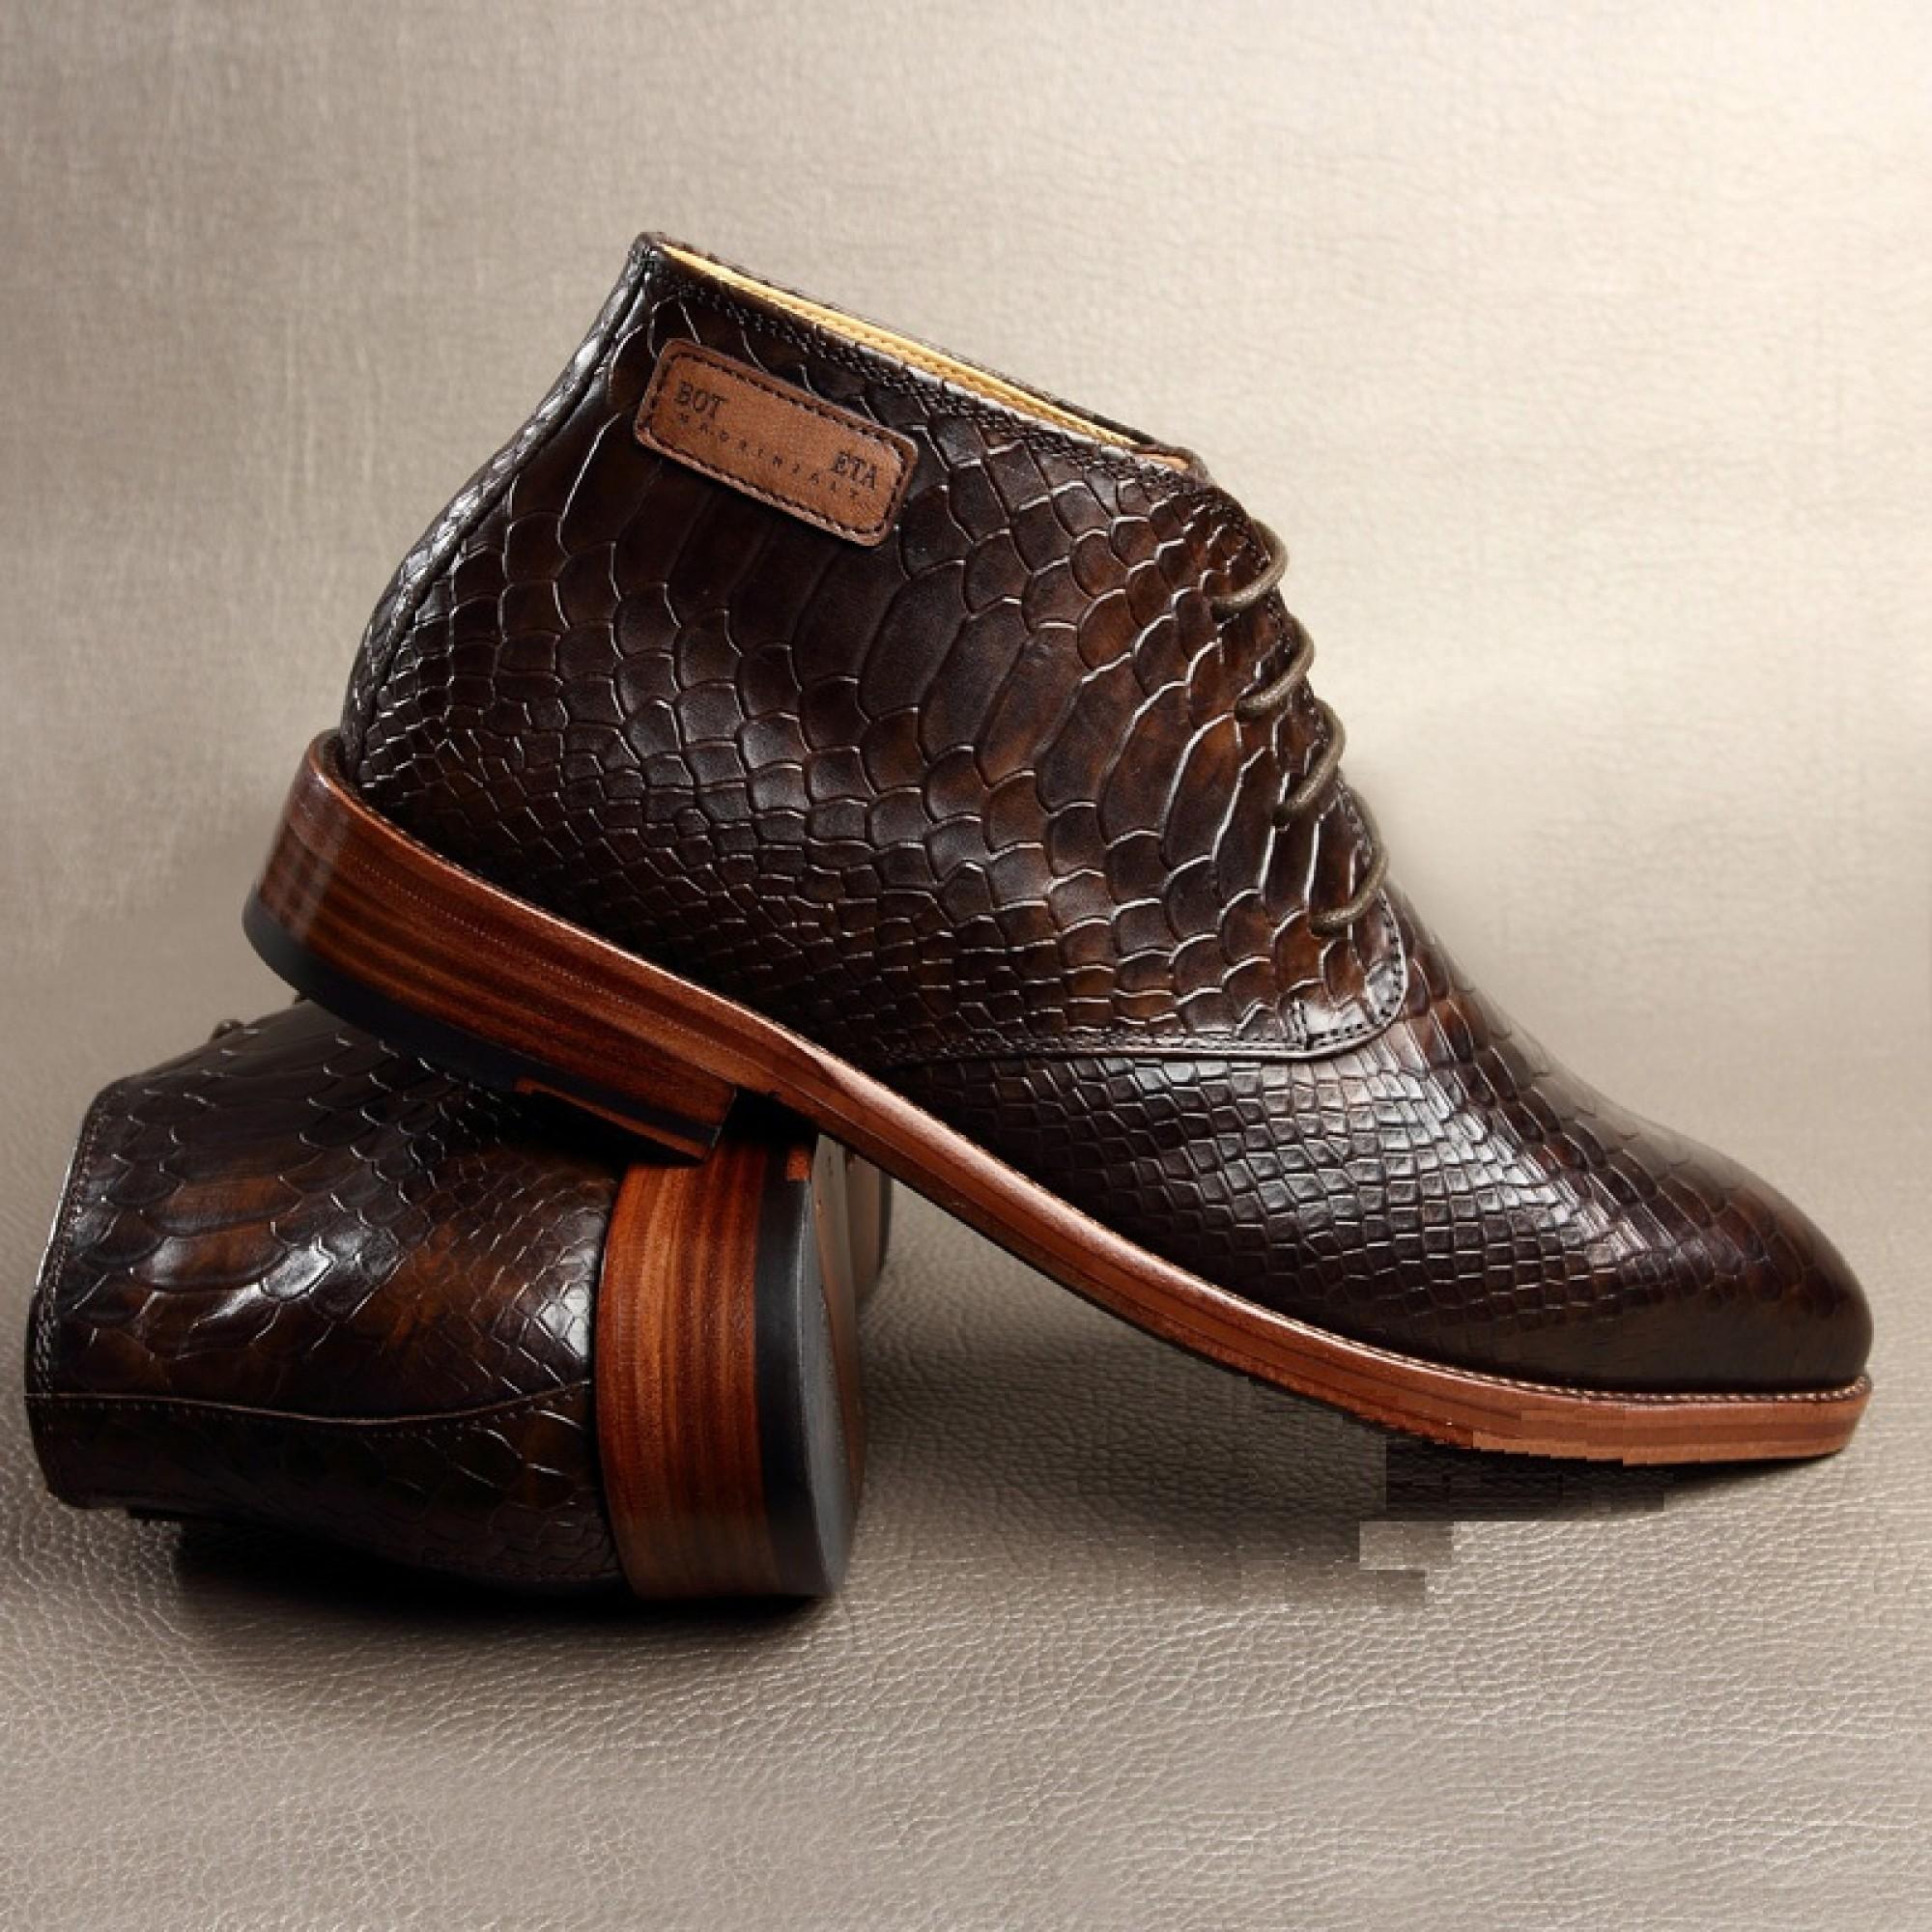 63a63ce6ad39 Коричневая мужская обувь Bottega Veneta